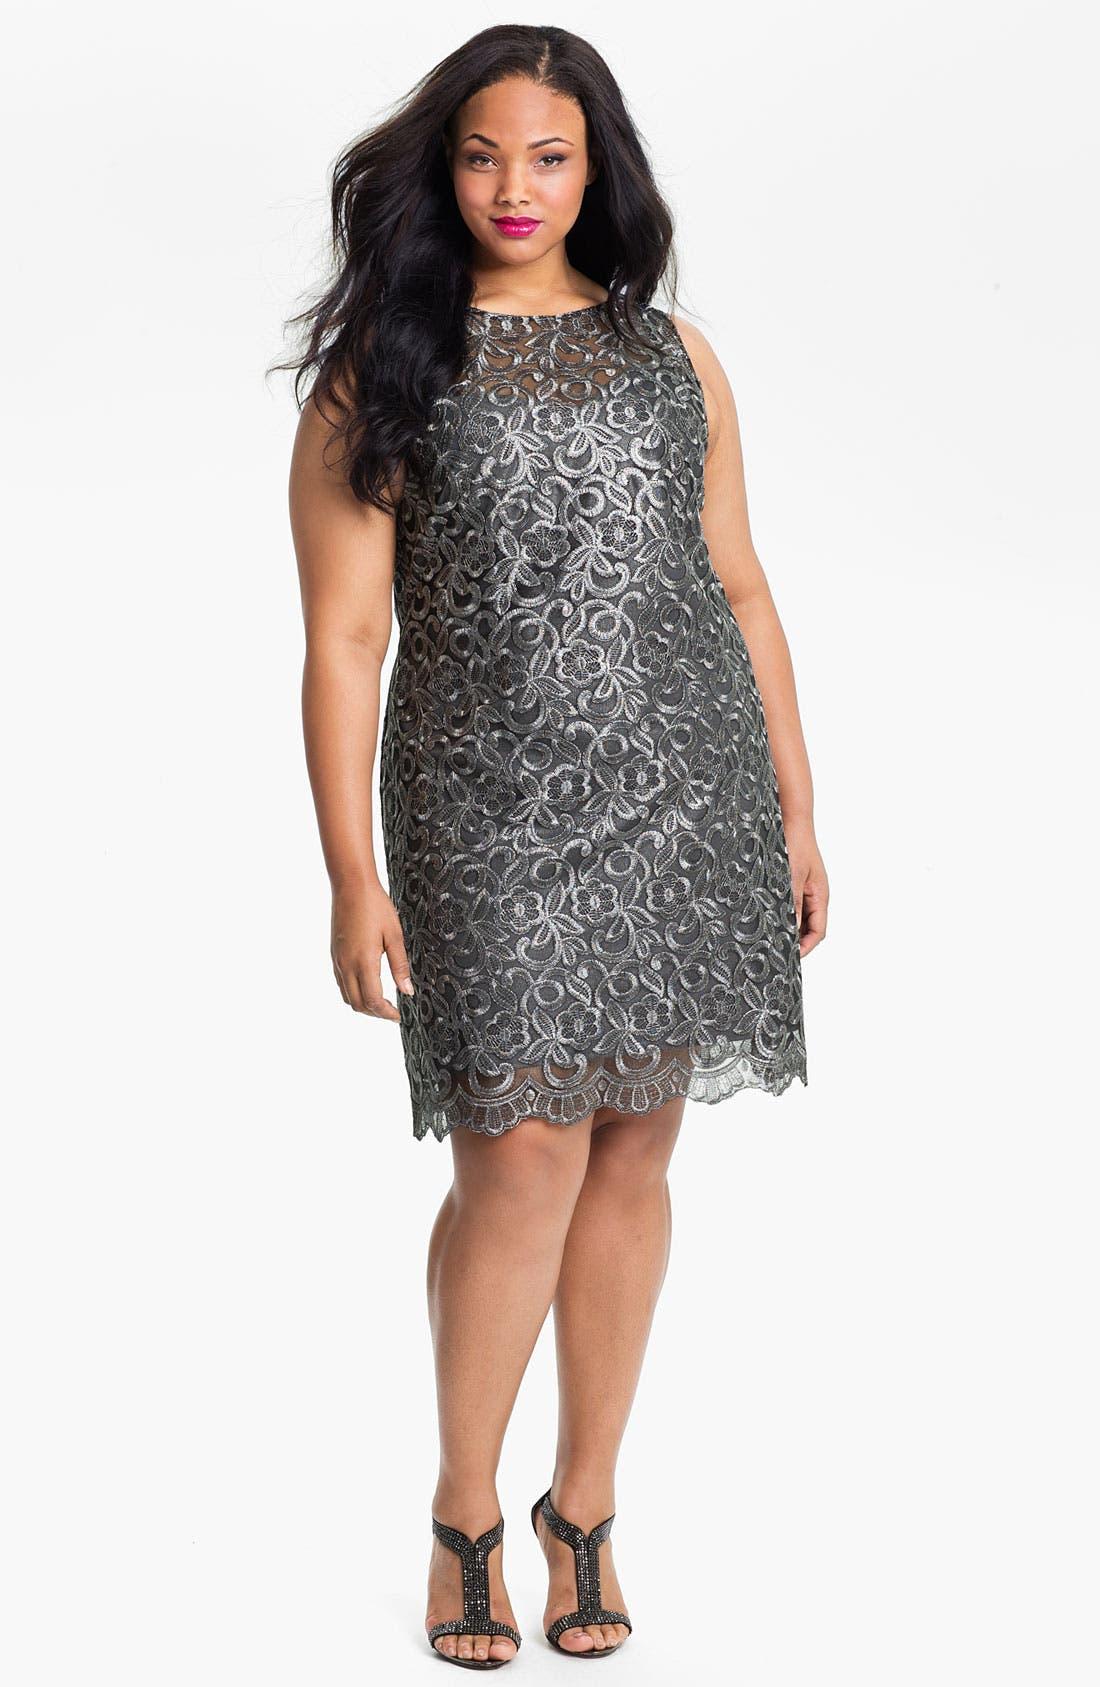 Alternate Image 1 Selected - Donna Ricco Illusion Bodice Sleeveless Sheath Dress (Plus)